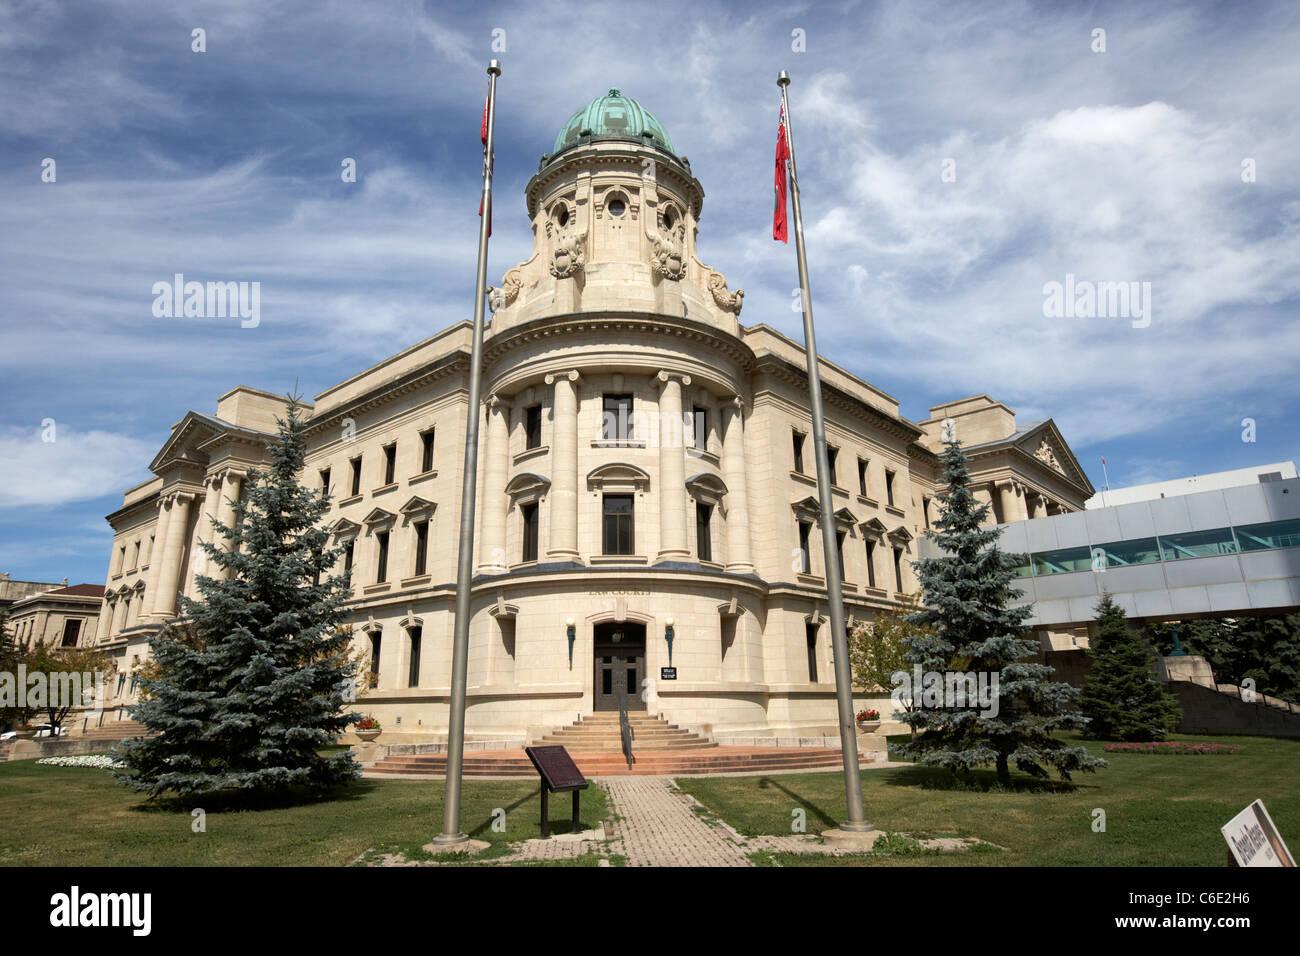 historic landmark law courts building winnipeg manitoba canada - Stock Image